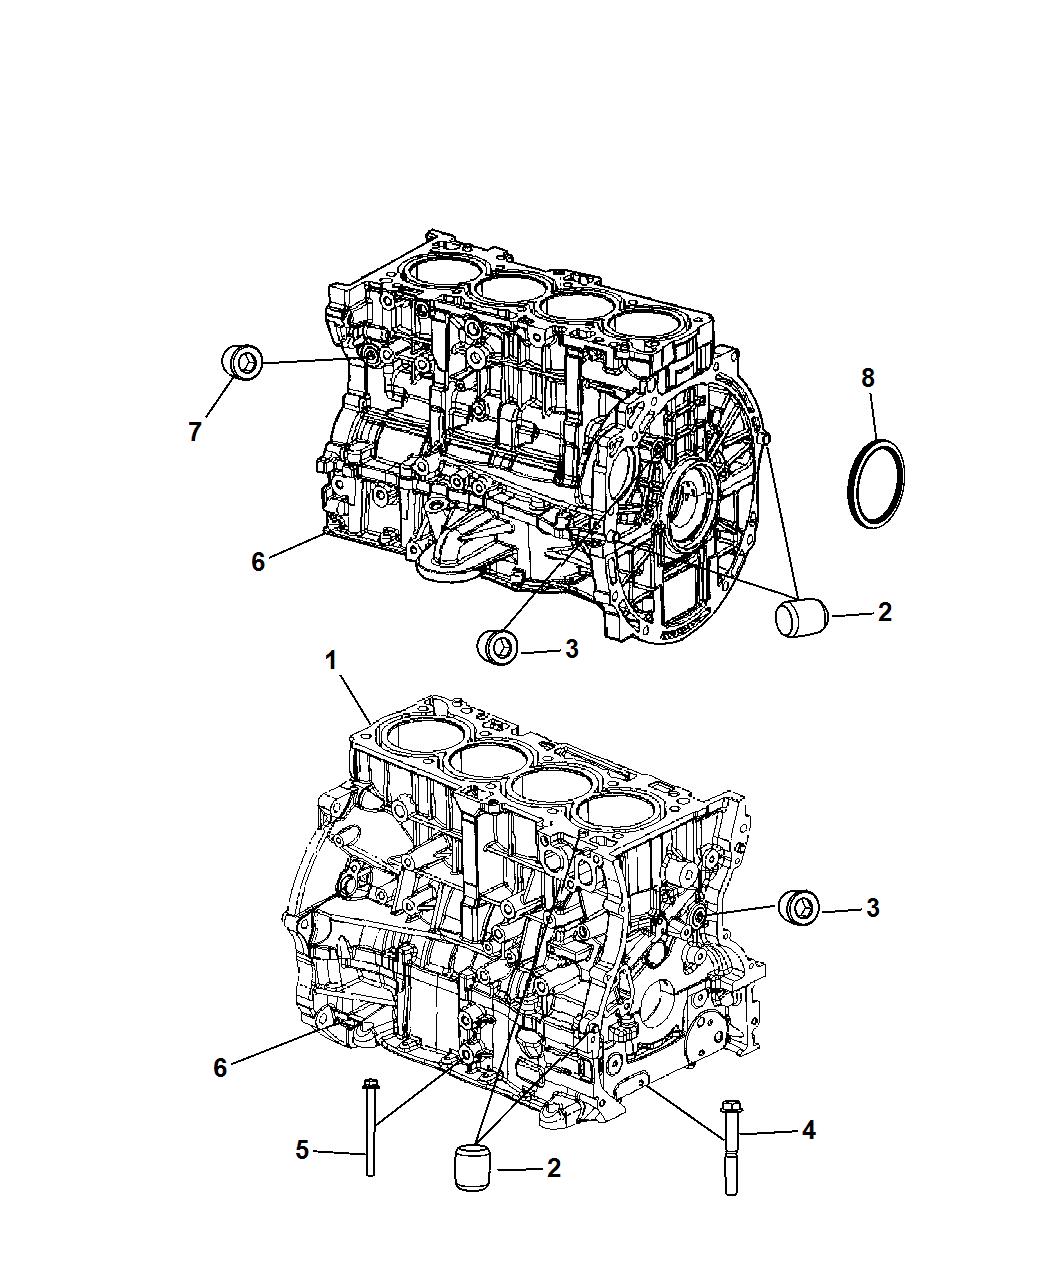 2 5 Dodge Avenger Engine Diagram Wiring Diagram Schematic Week Store A Week Store A Aliceviola It